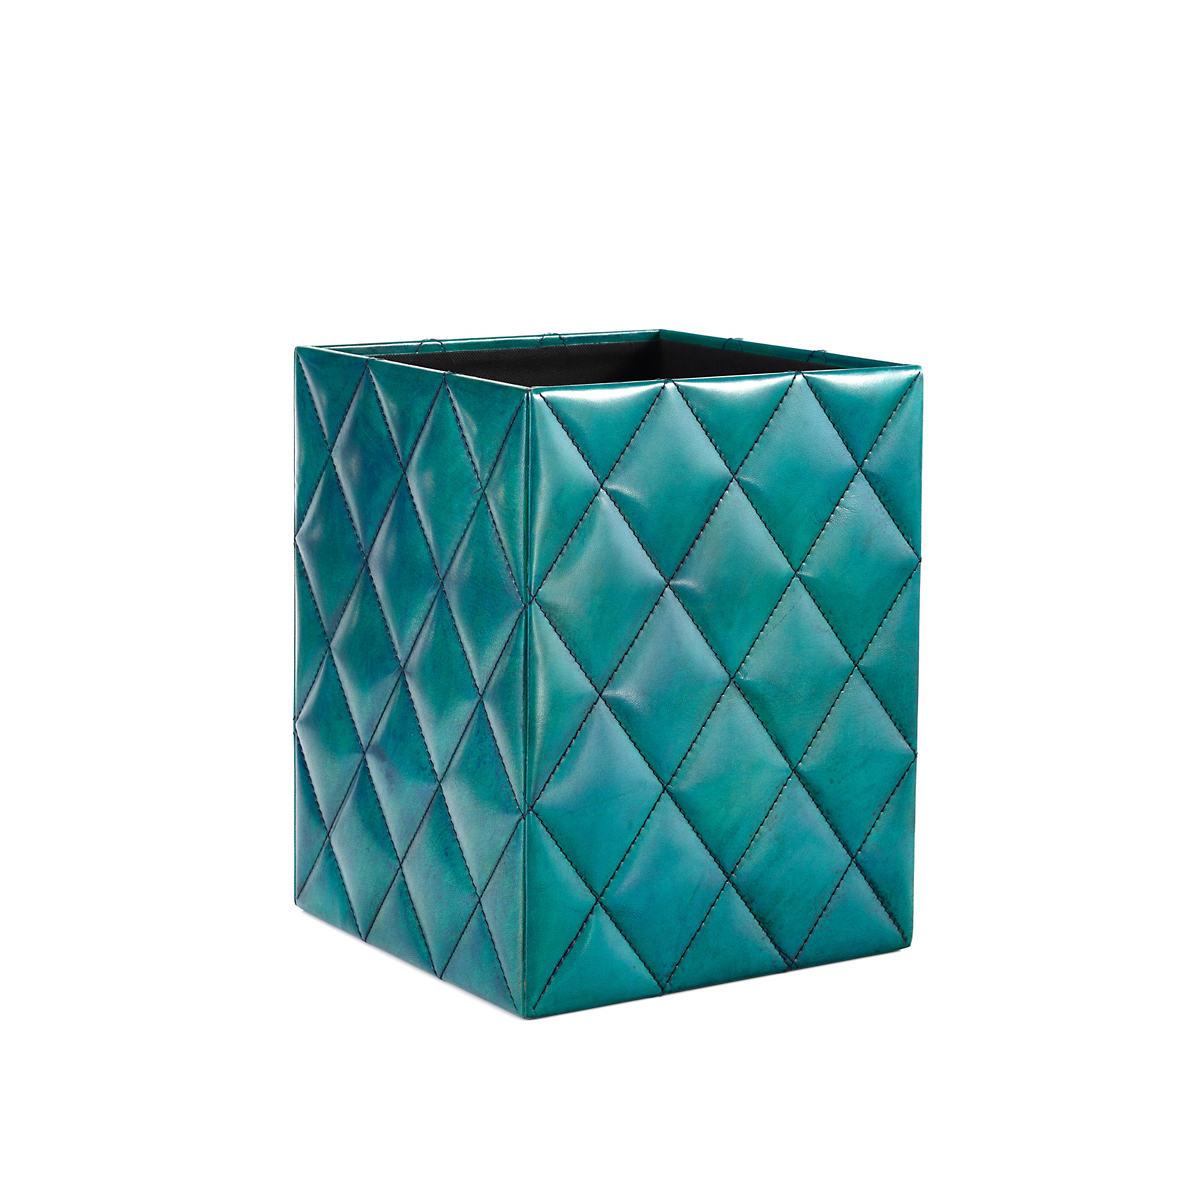 Watson Leather Turquoise Wastebasket